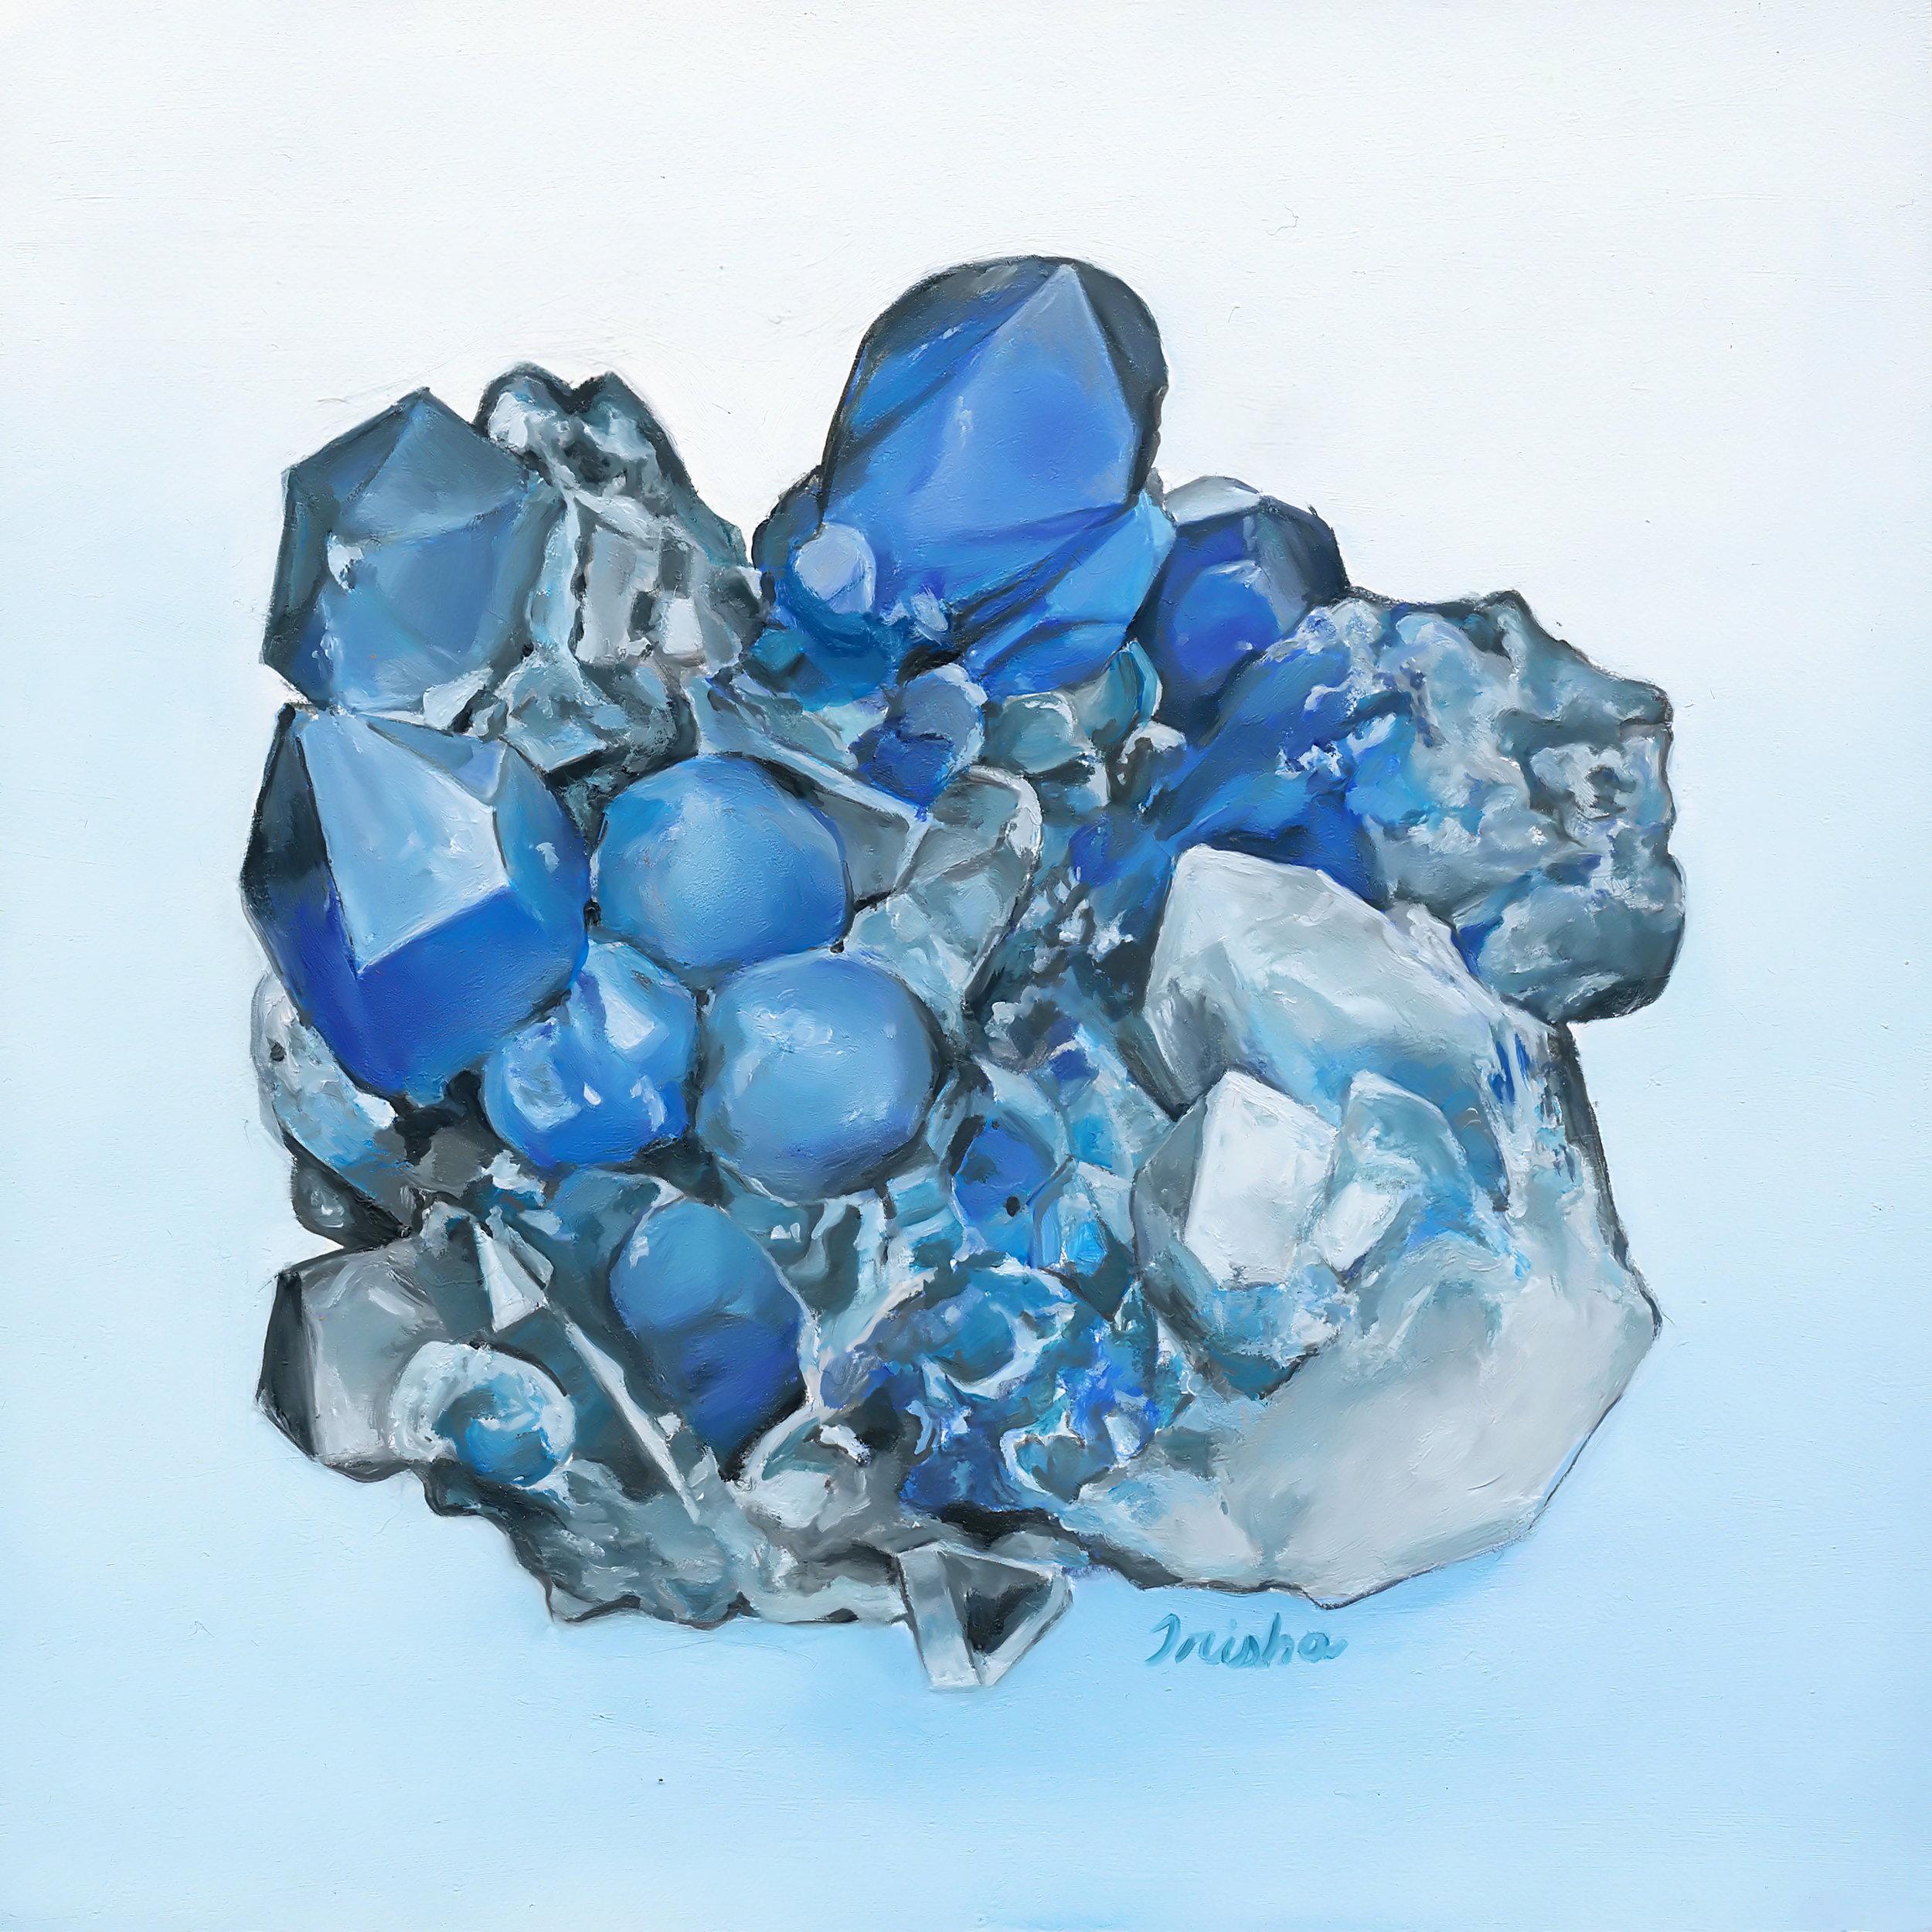 Quartz Papagoite (ITEM NO: 006)  Print Size: 8x8 inches  $12.50 Wholesale at 50% off  $25 RRP